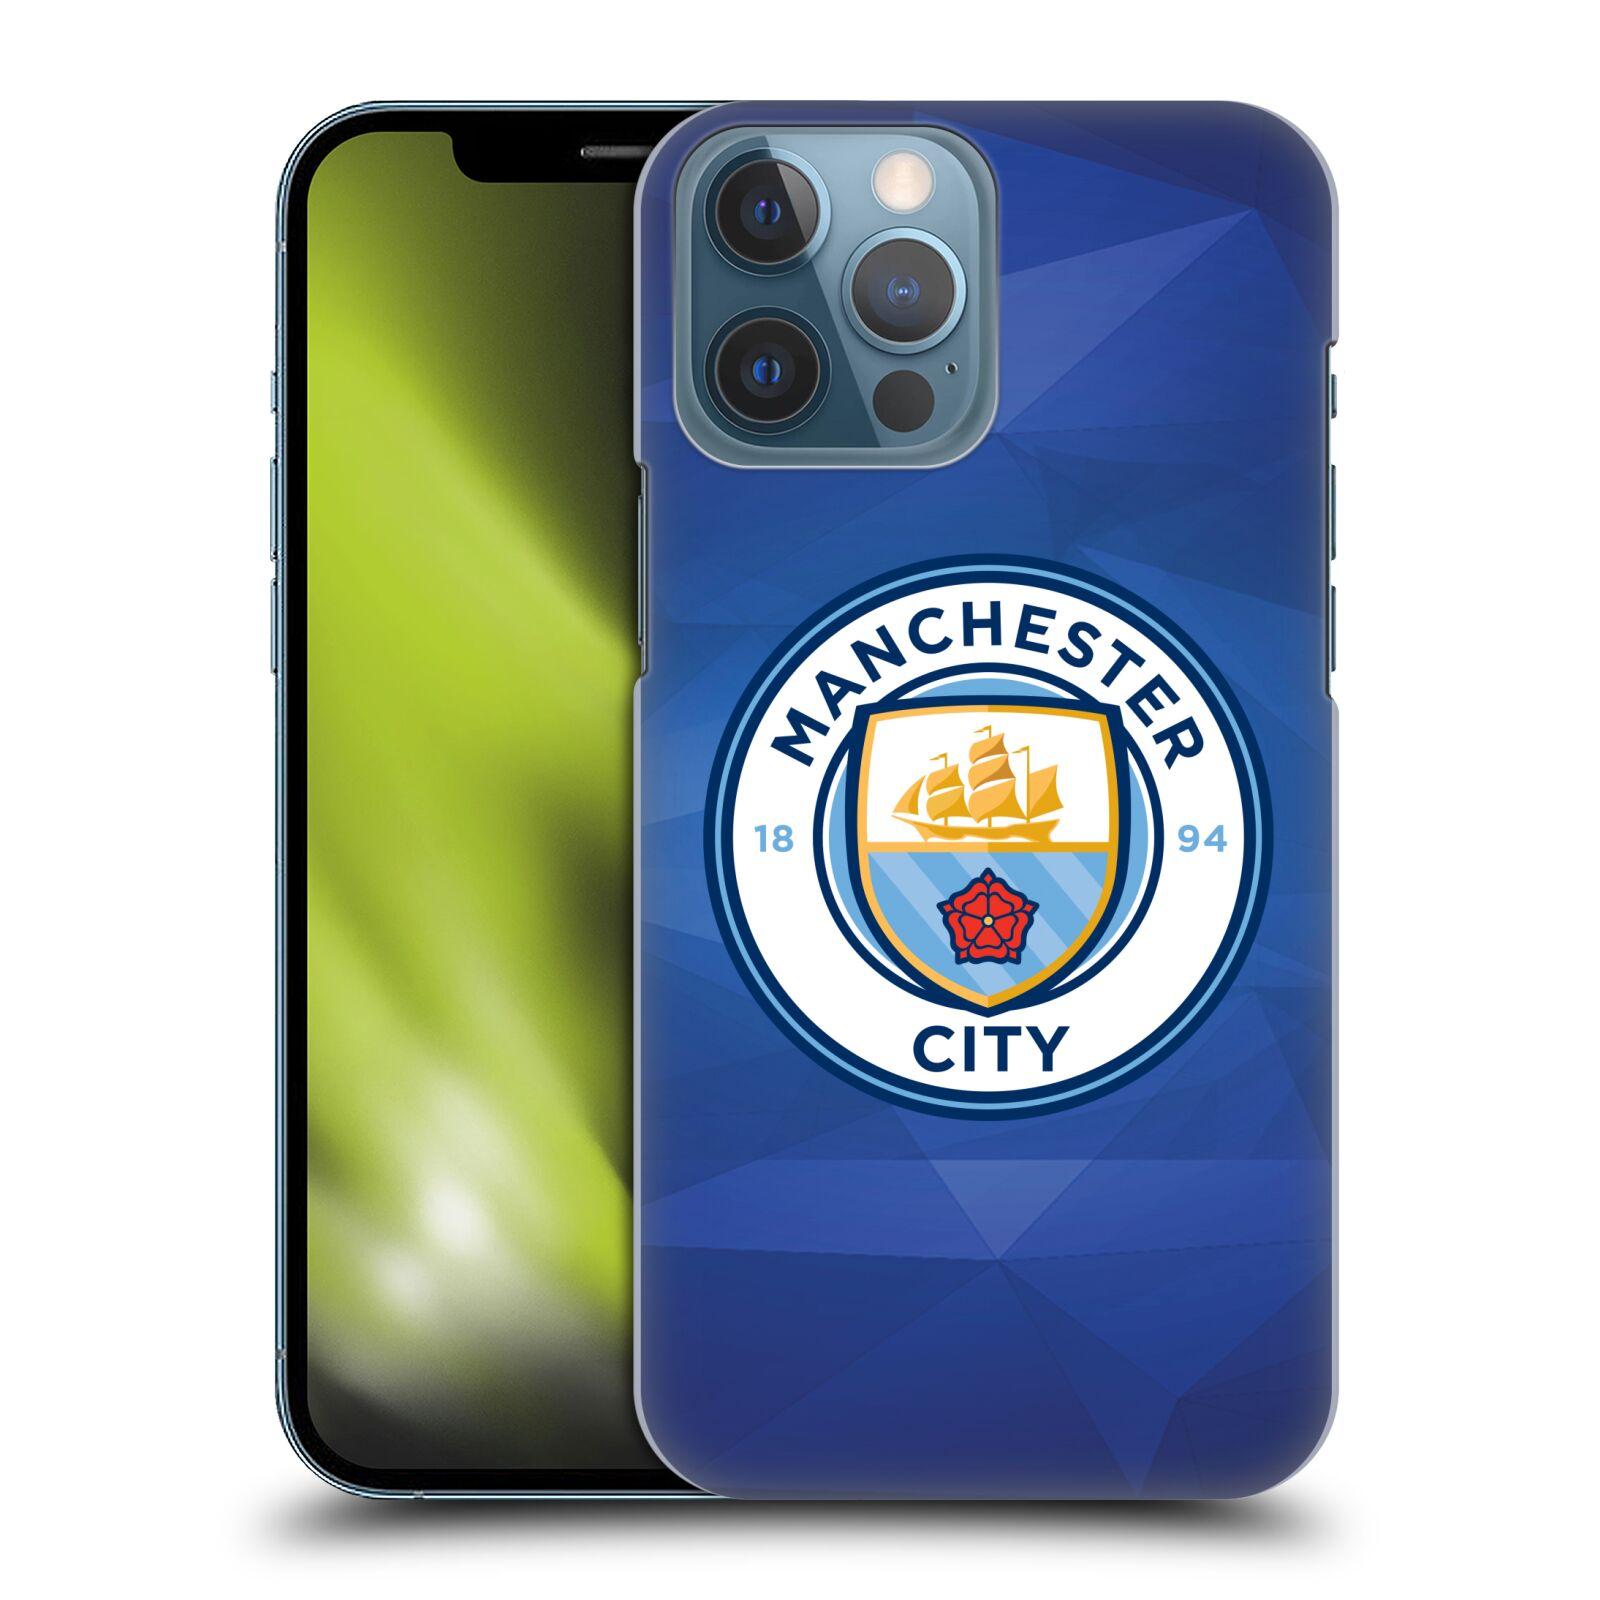 Plastové pouzdro na mobil Apple iPhone 13 Pro Max - Head Case - Manchester City FC - Modré nové logo